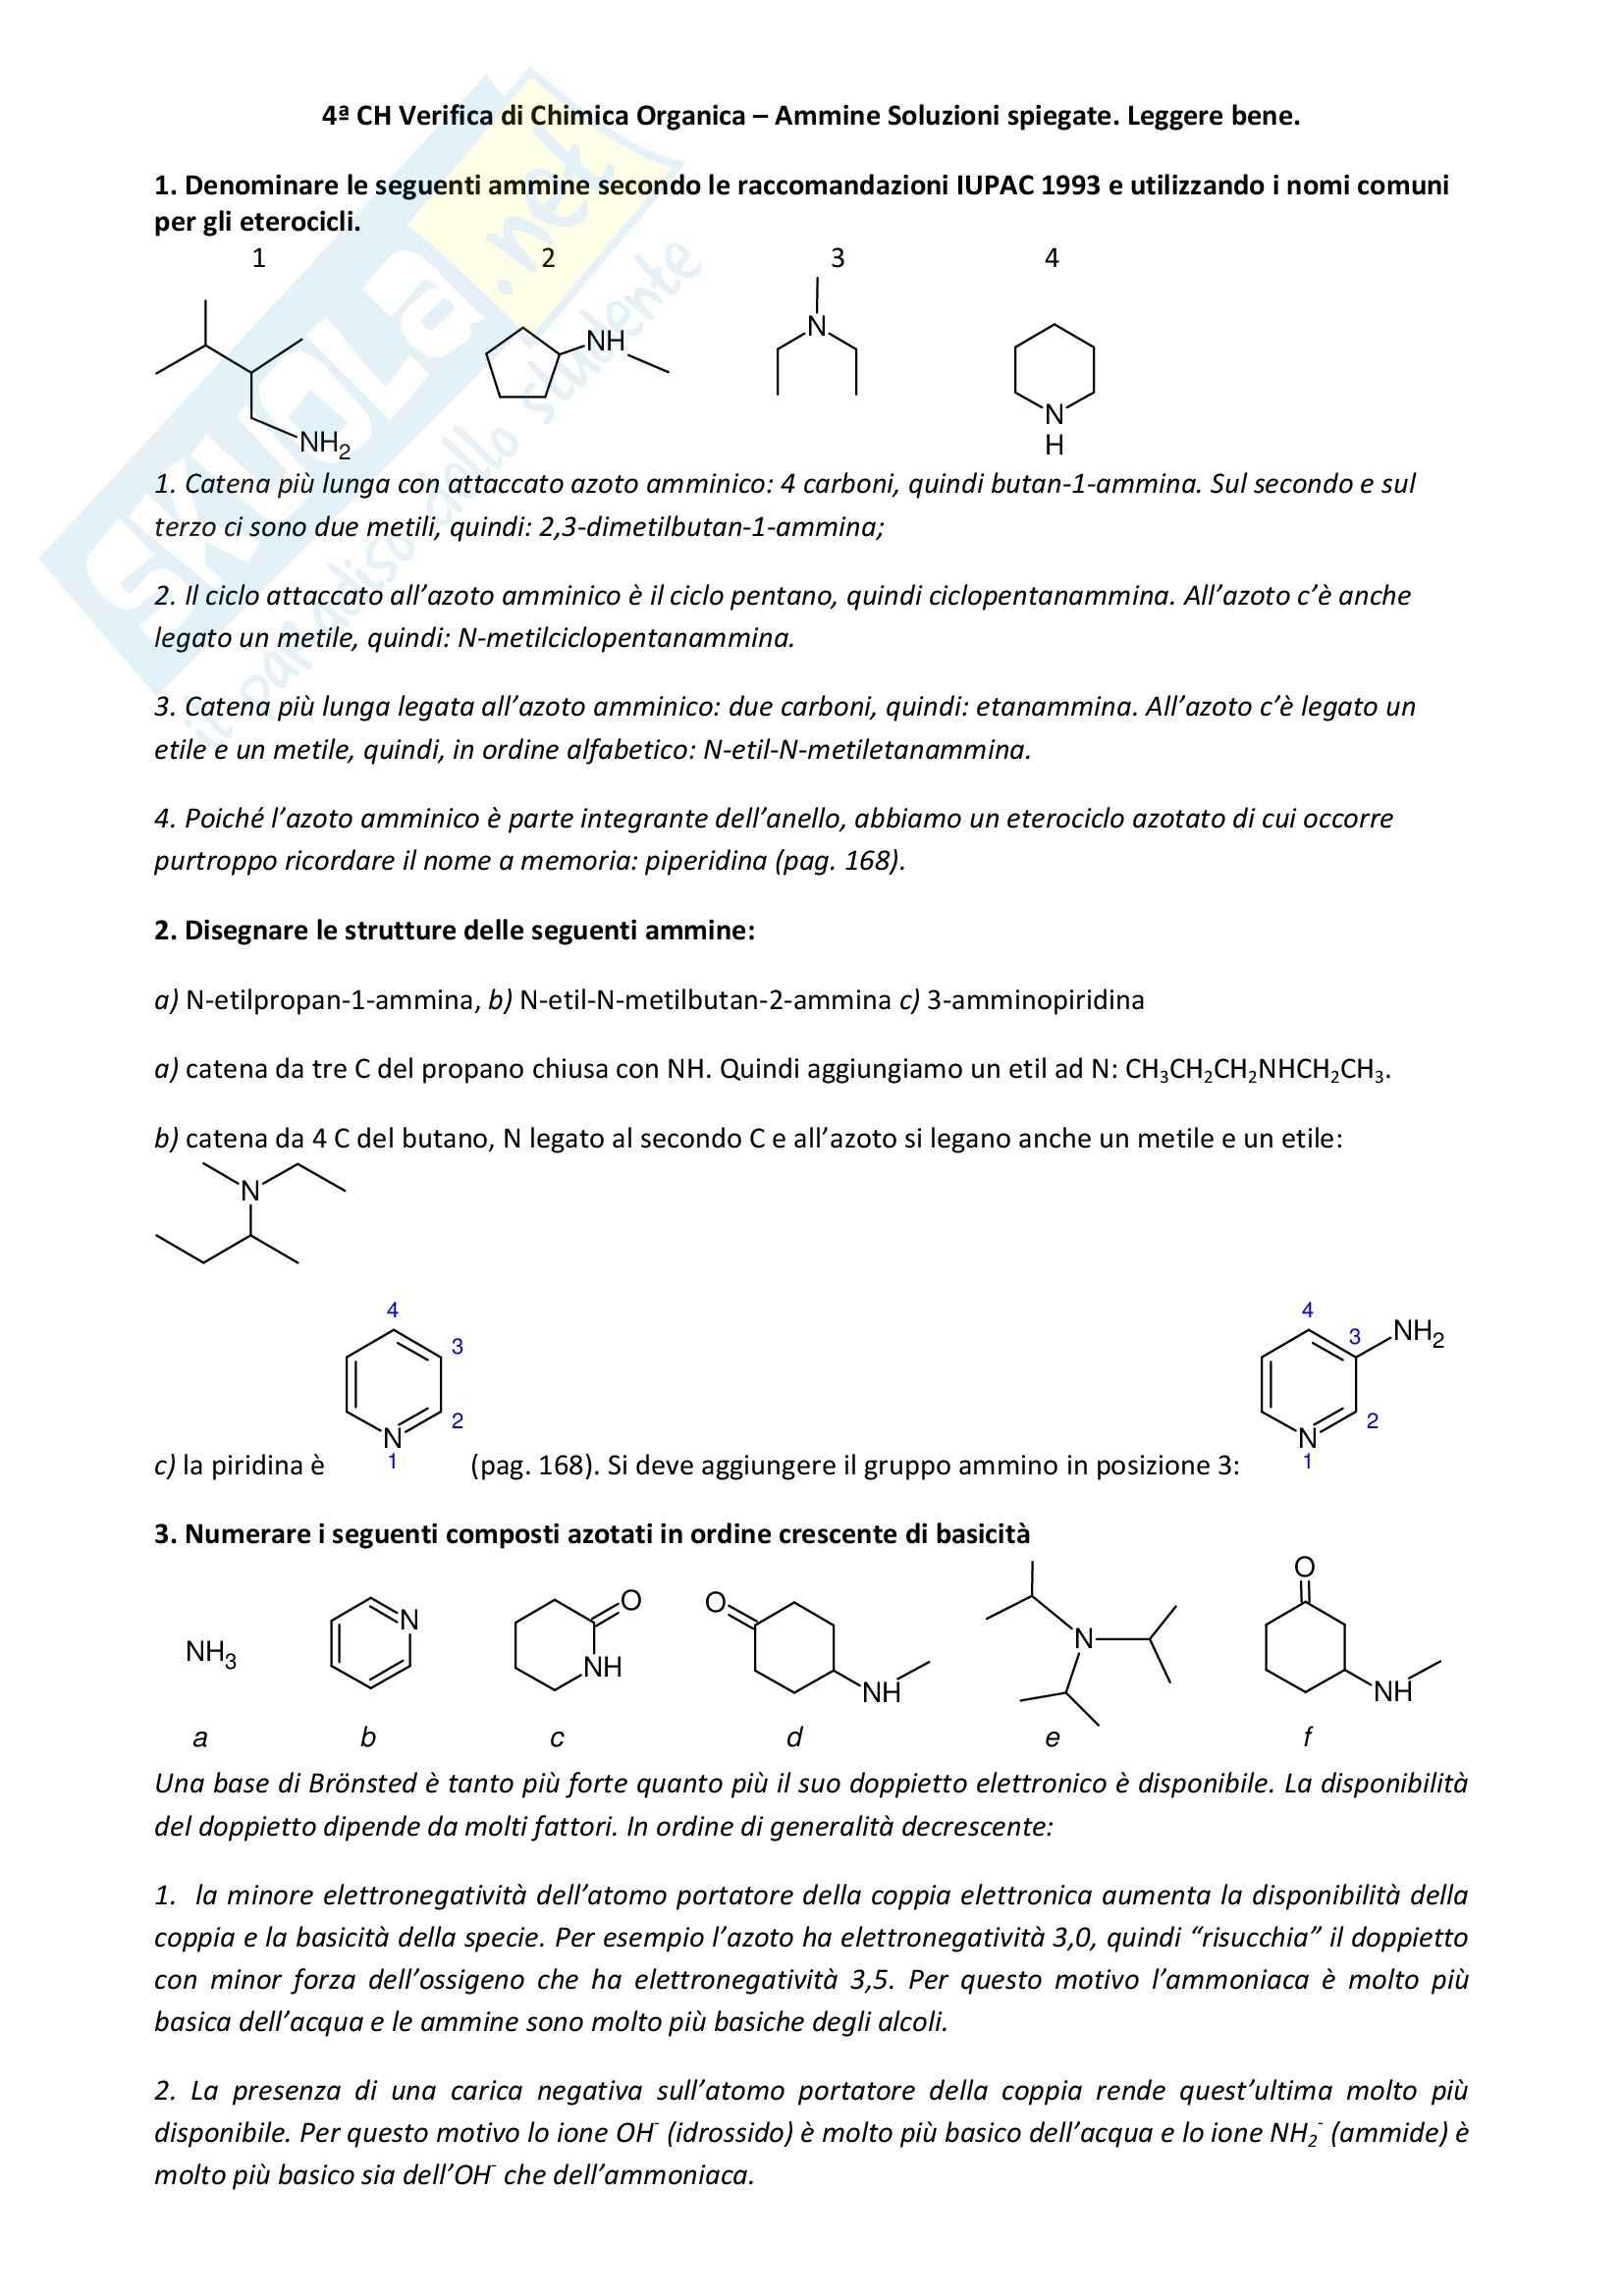 Chimica organica - Esercizi ammine